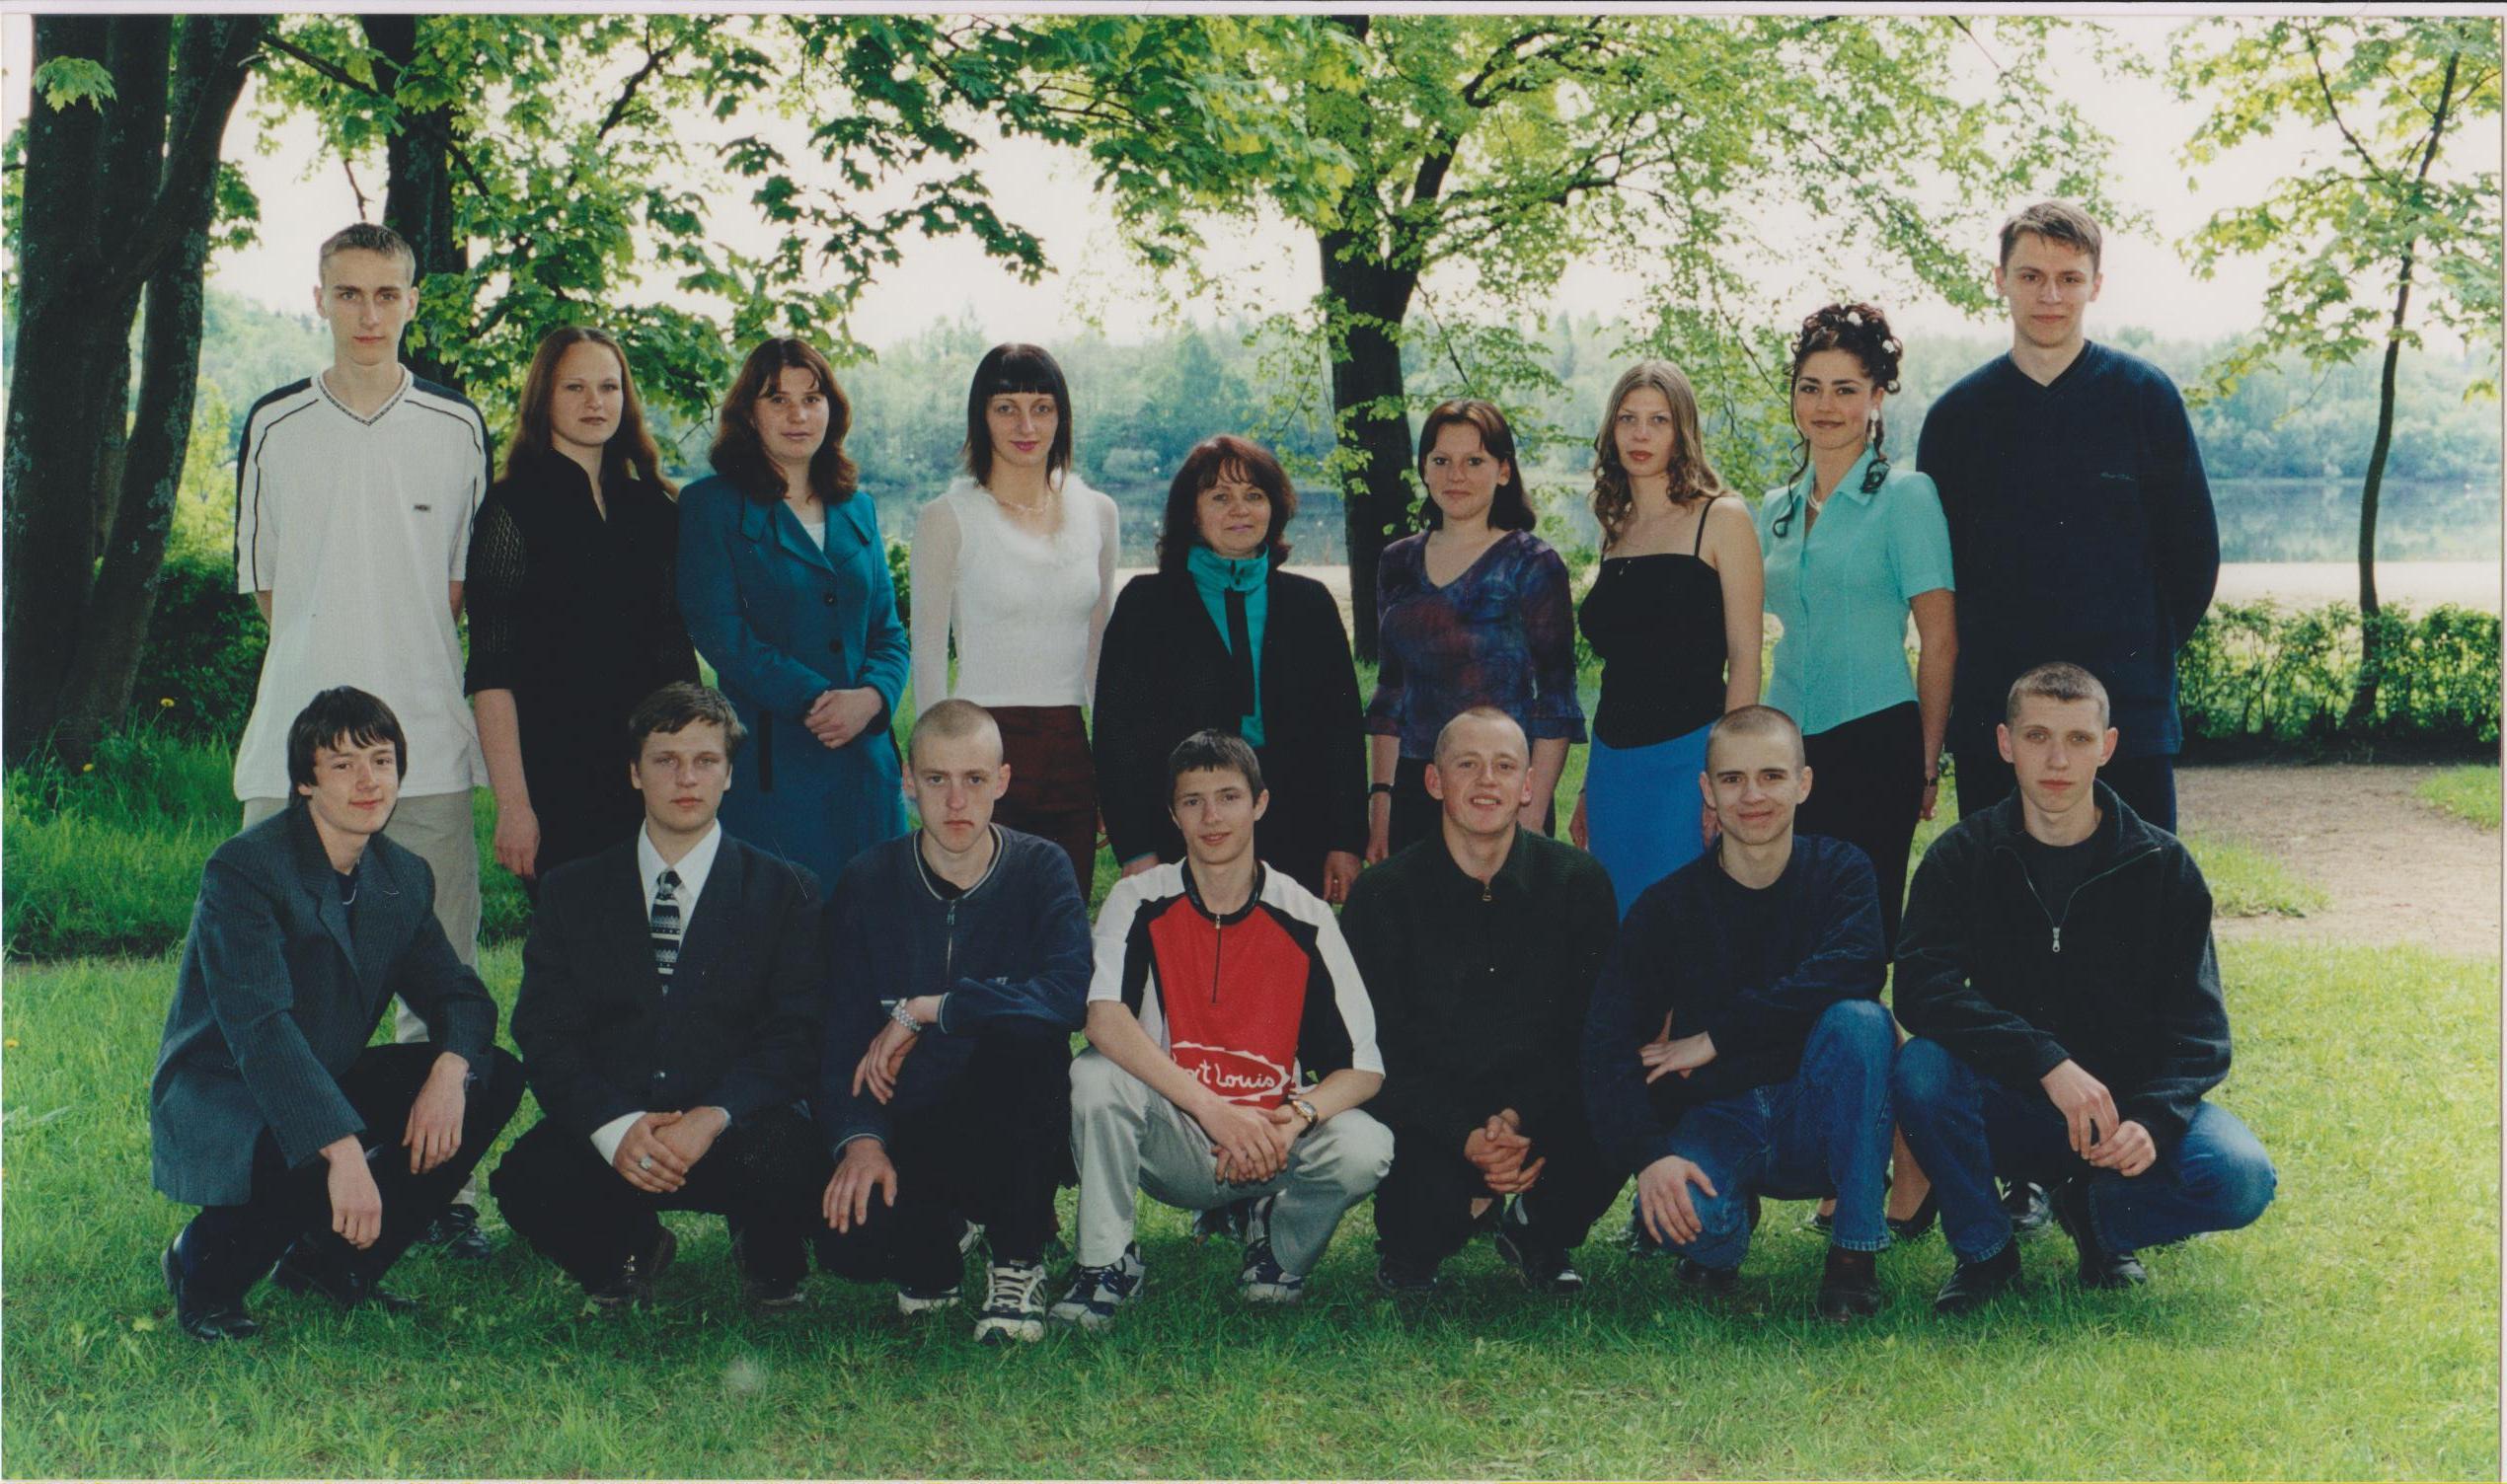 2001.gads kl.audz Tatjana Starčenko